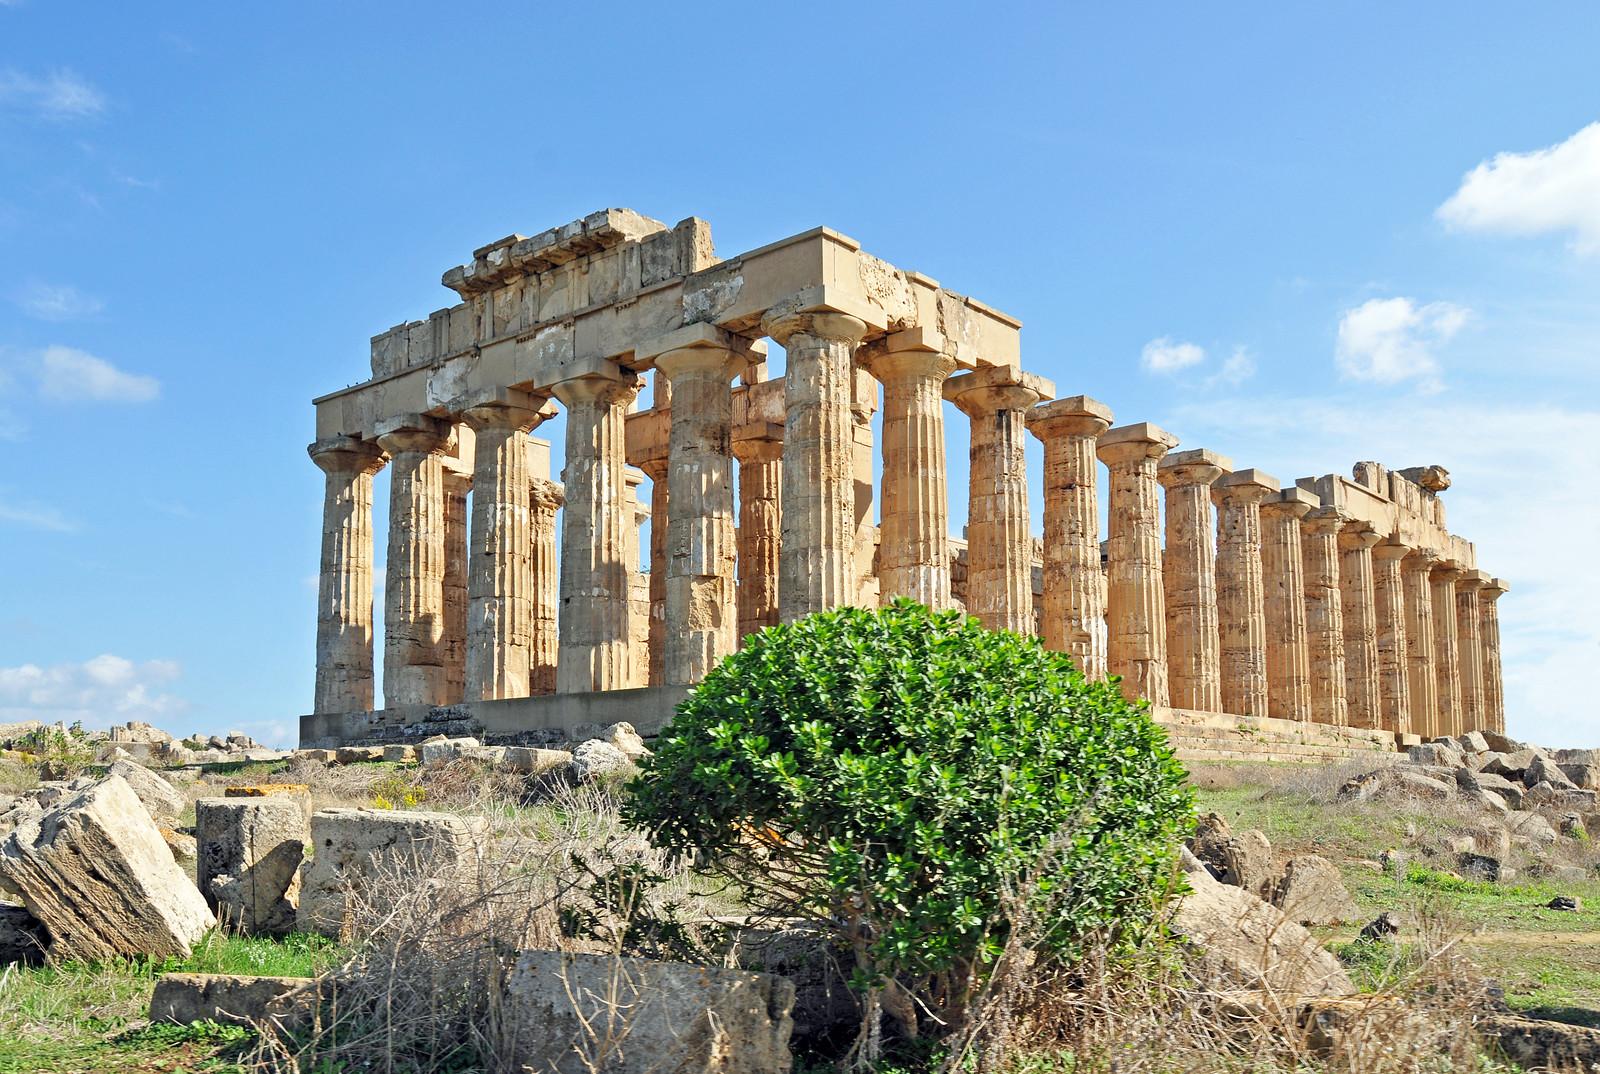 Italy-2276 - Temple of Hera